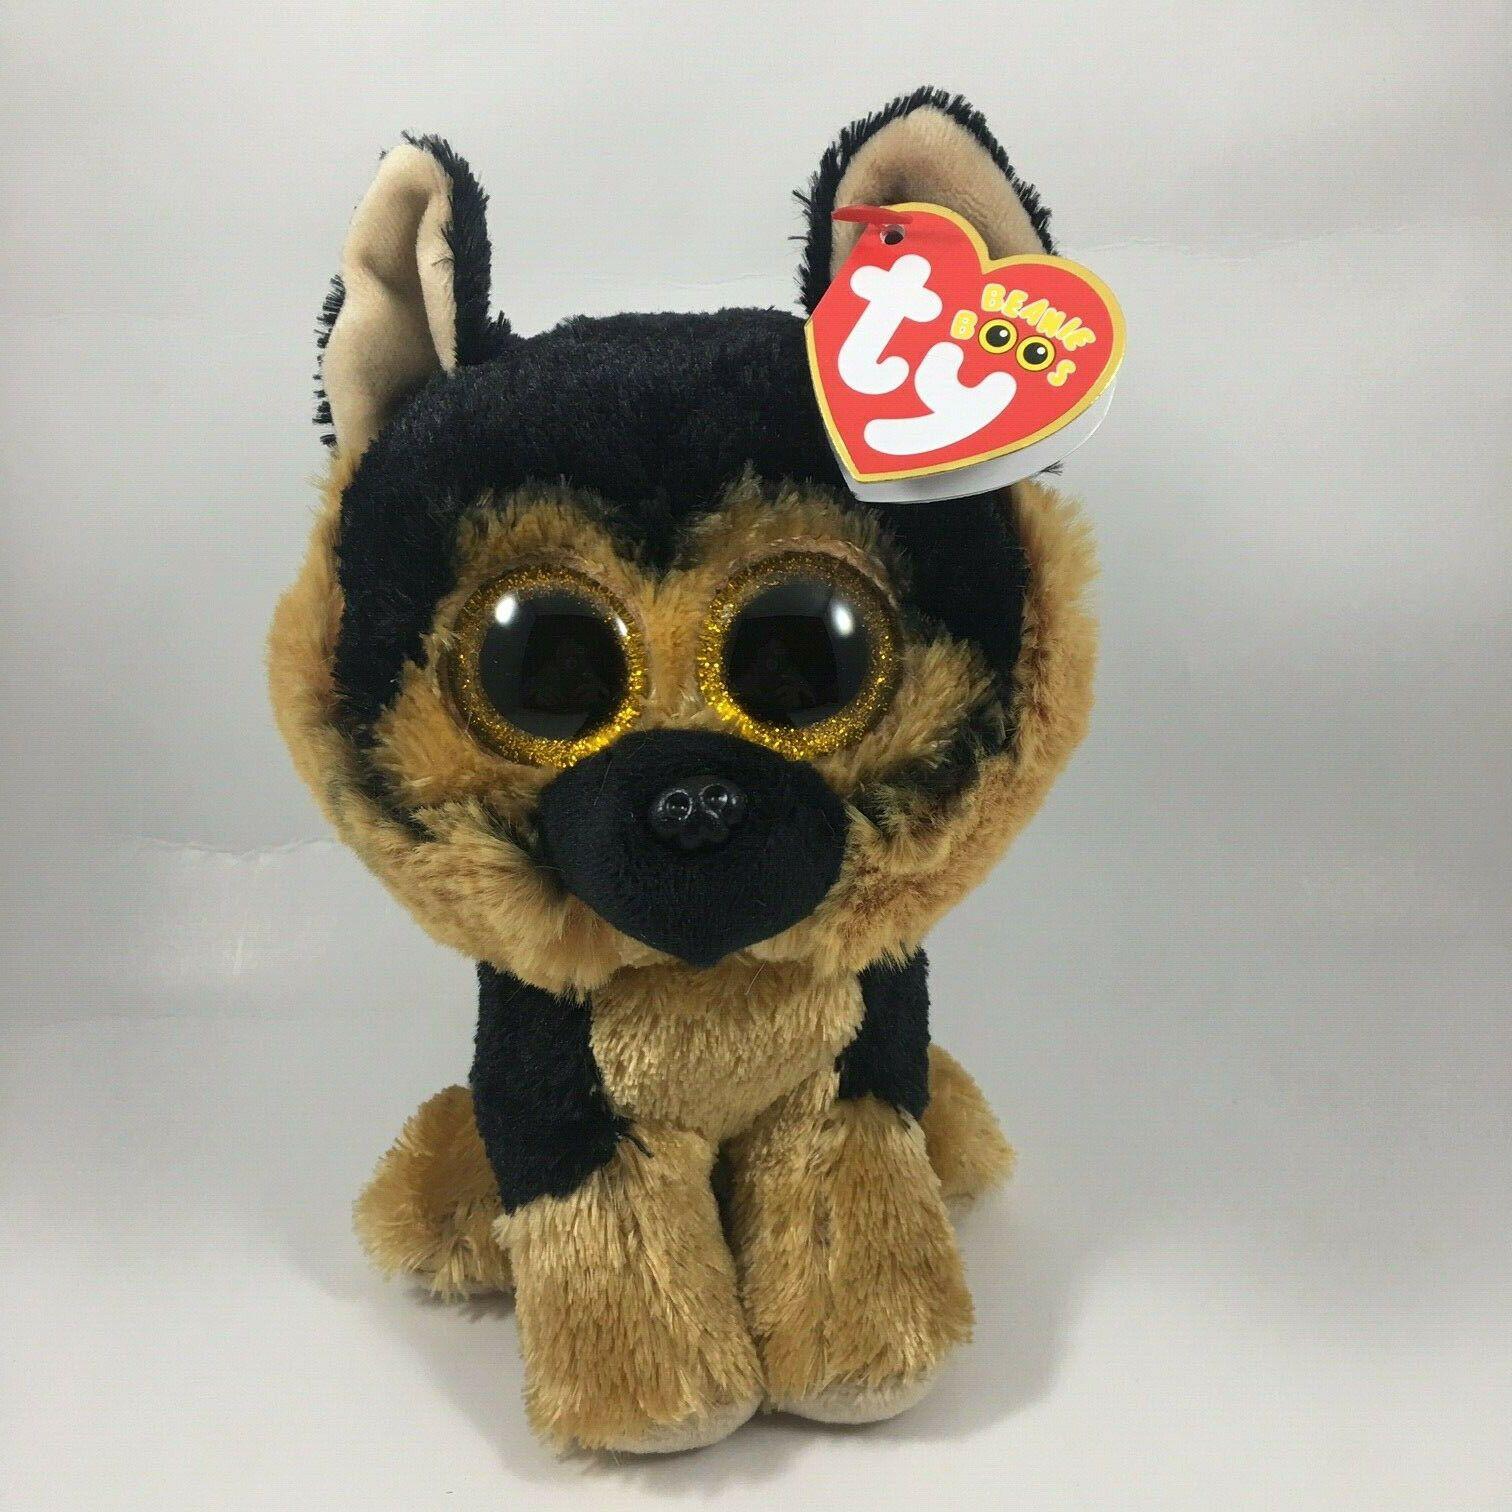 2020 Ty Beanie Boos 6 Spirit German Shepherd Dog Stuffed Animal Toy Plush Mwmts 8421363094 Ebay In 2021 Ty Stuffed Animals Beanie Boos Beanie Boo Dogs [ 1512 x 1512 Pixel ]